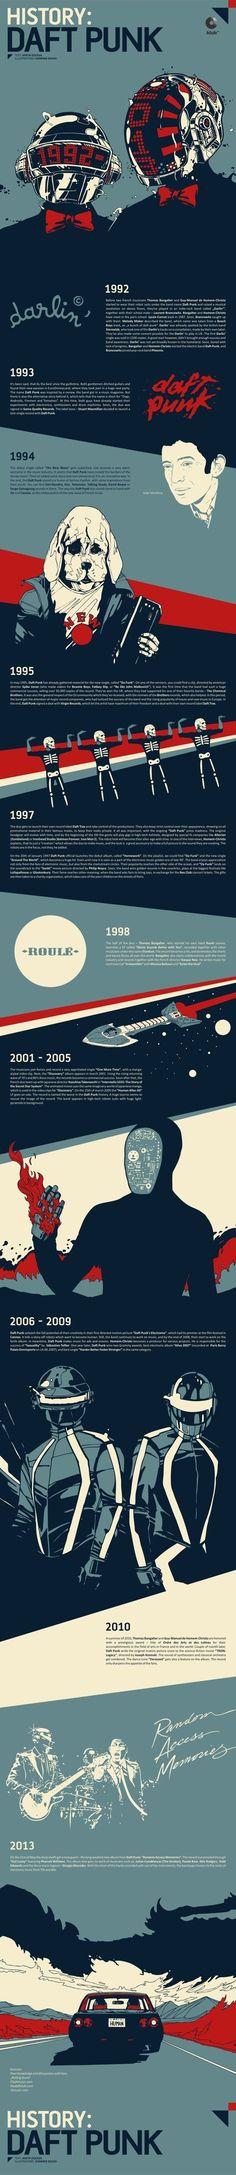 History: Daft Punk (infographic) by Marcin Kowalik, via Behance: